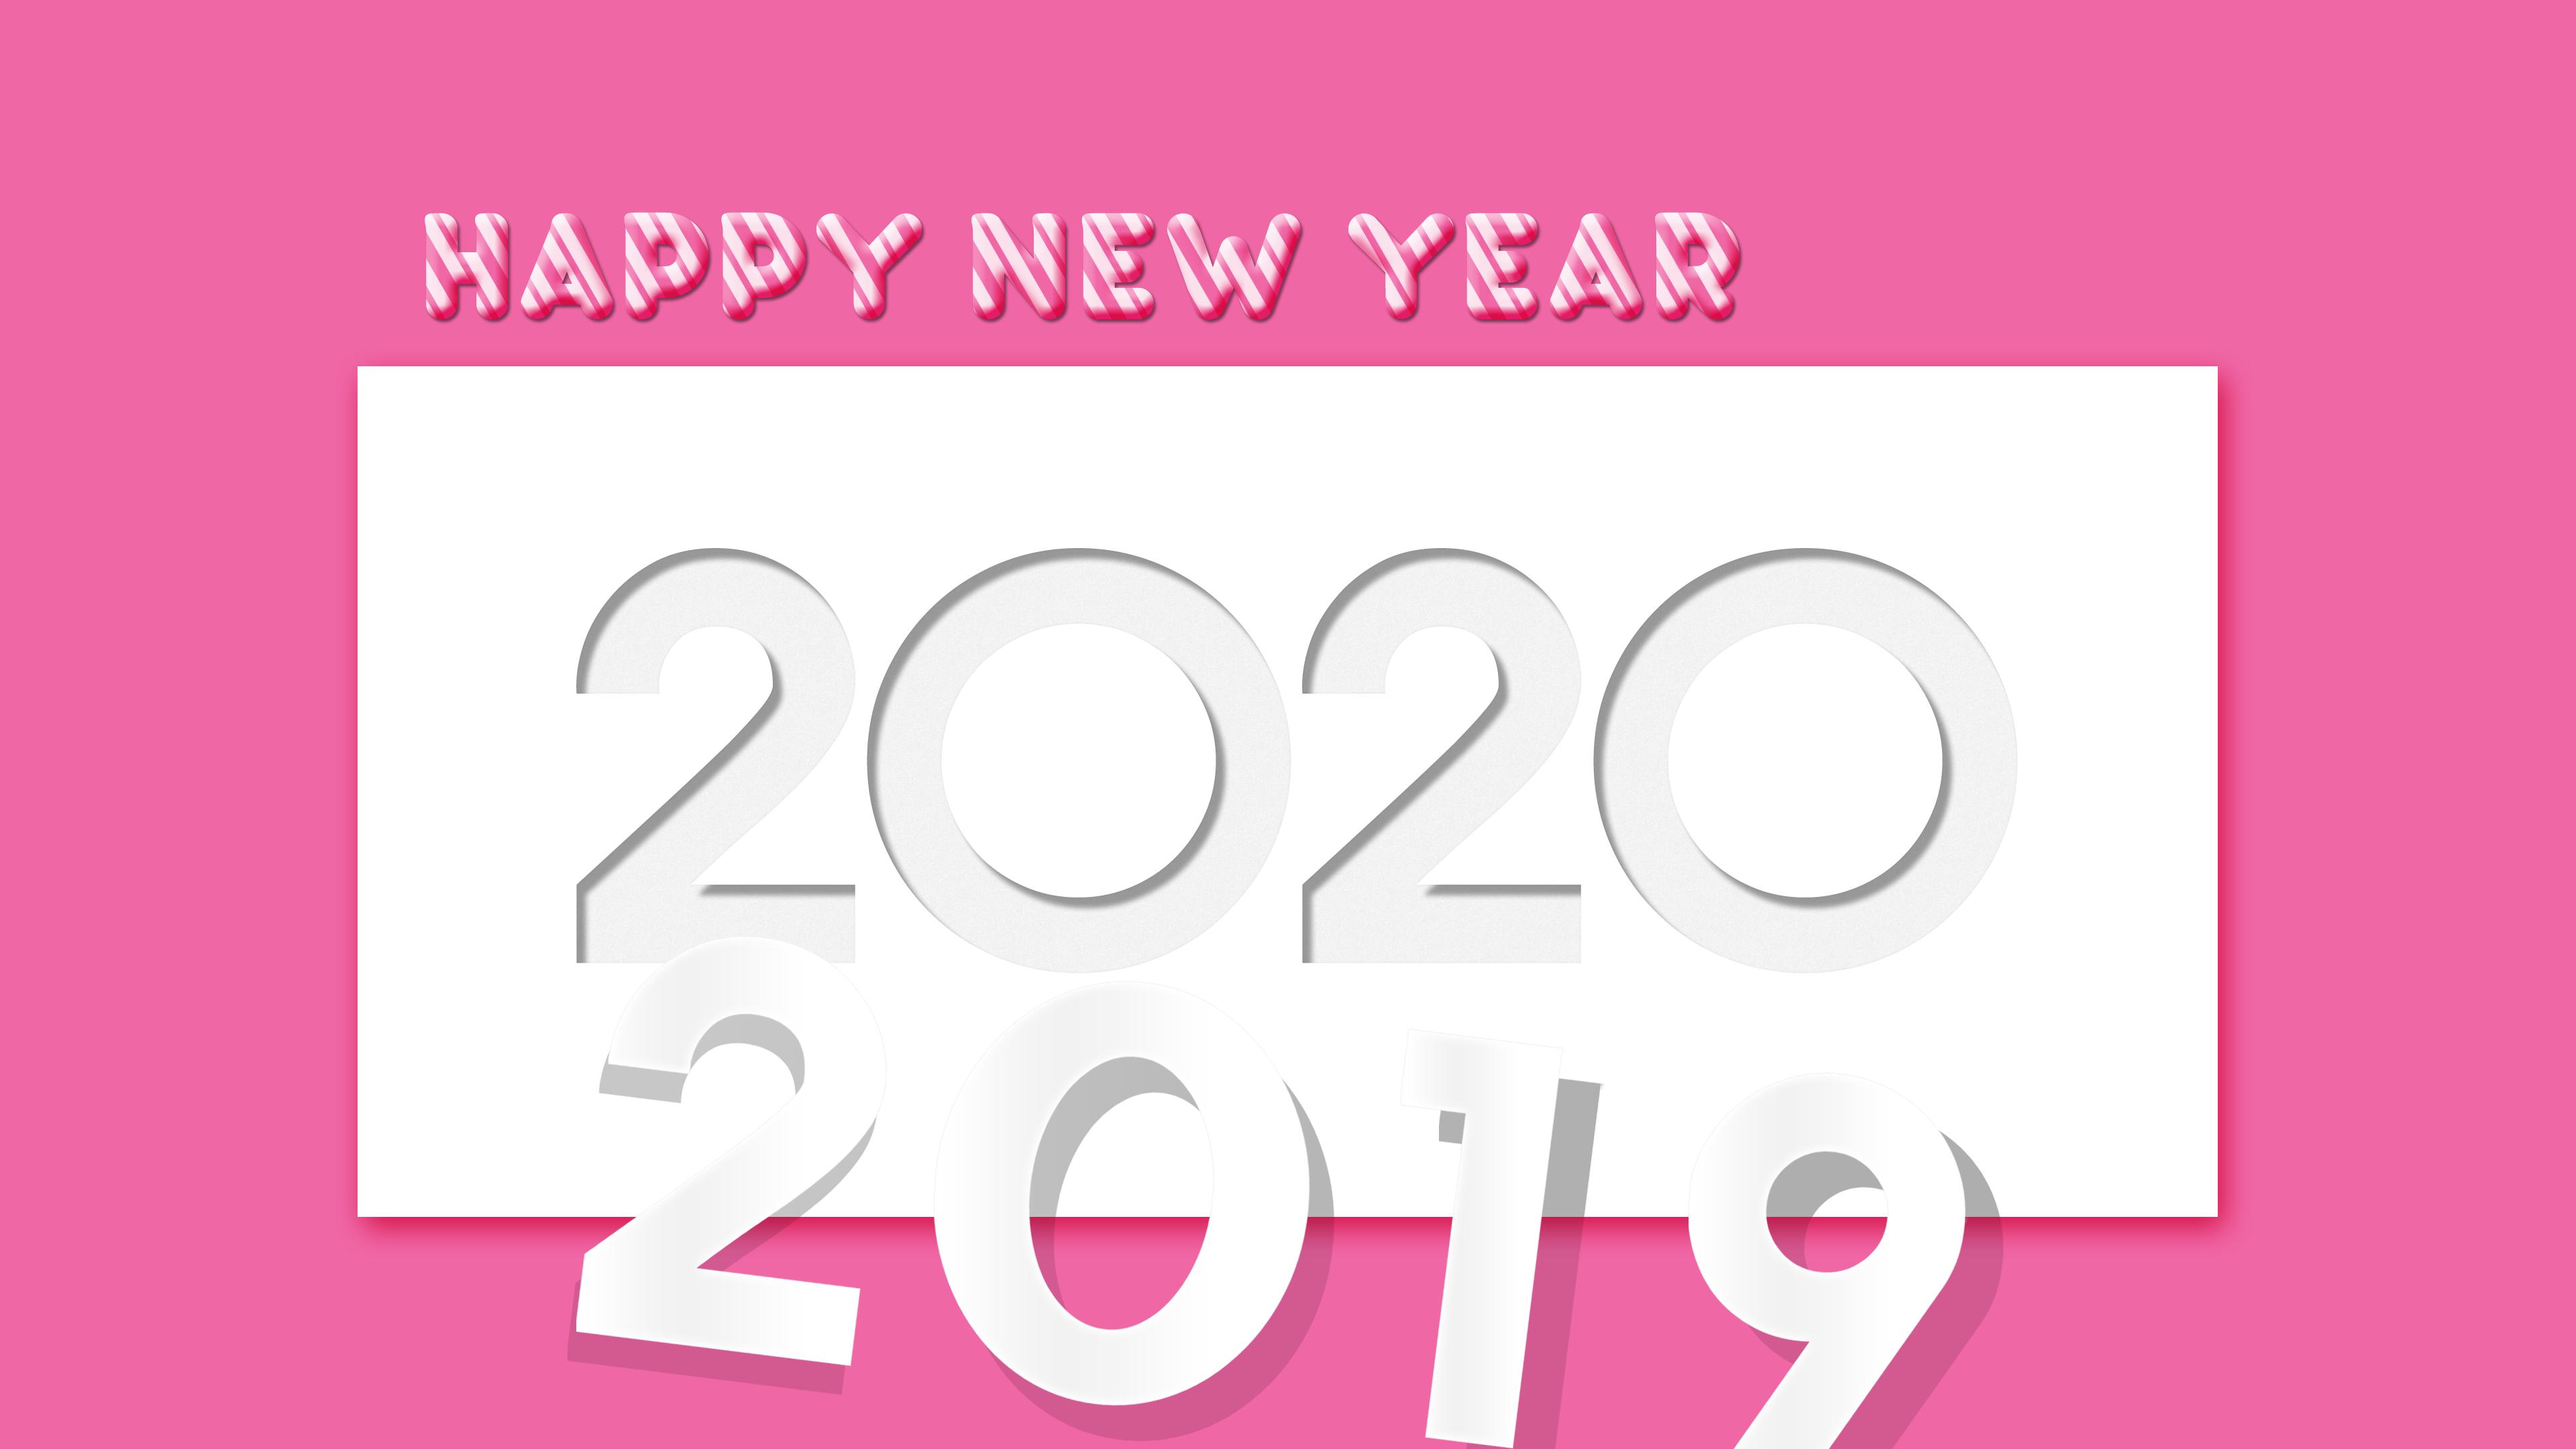 New Year 2020 4k Ultra HD Wallpaper Background Image 3840x2160 3840x2160